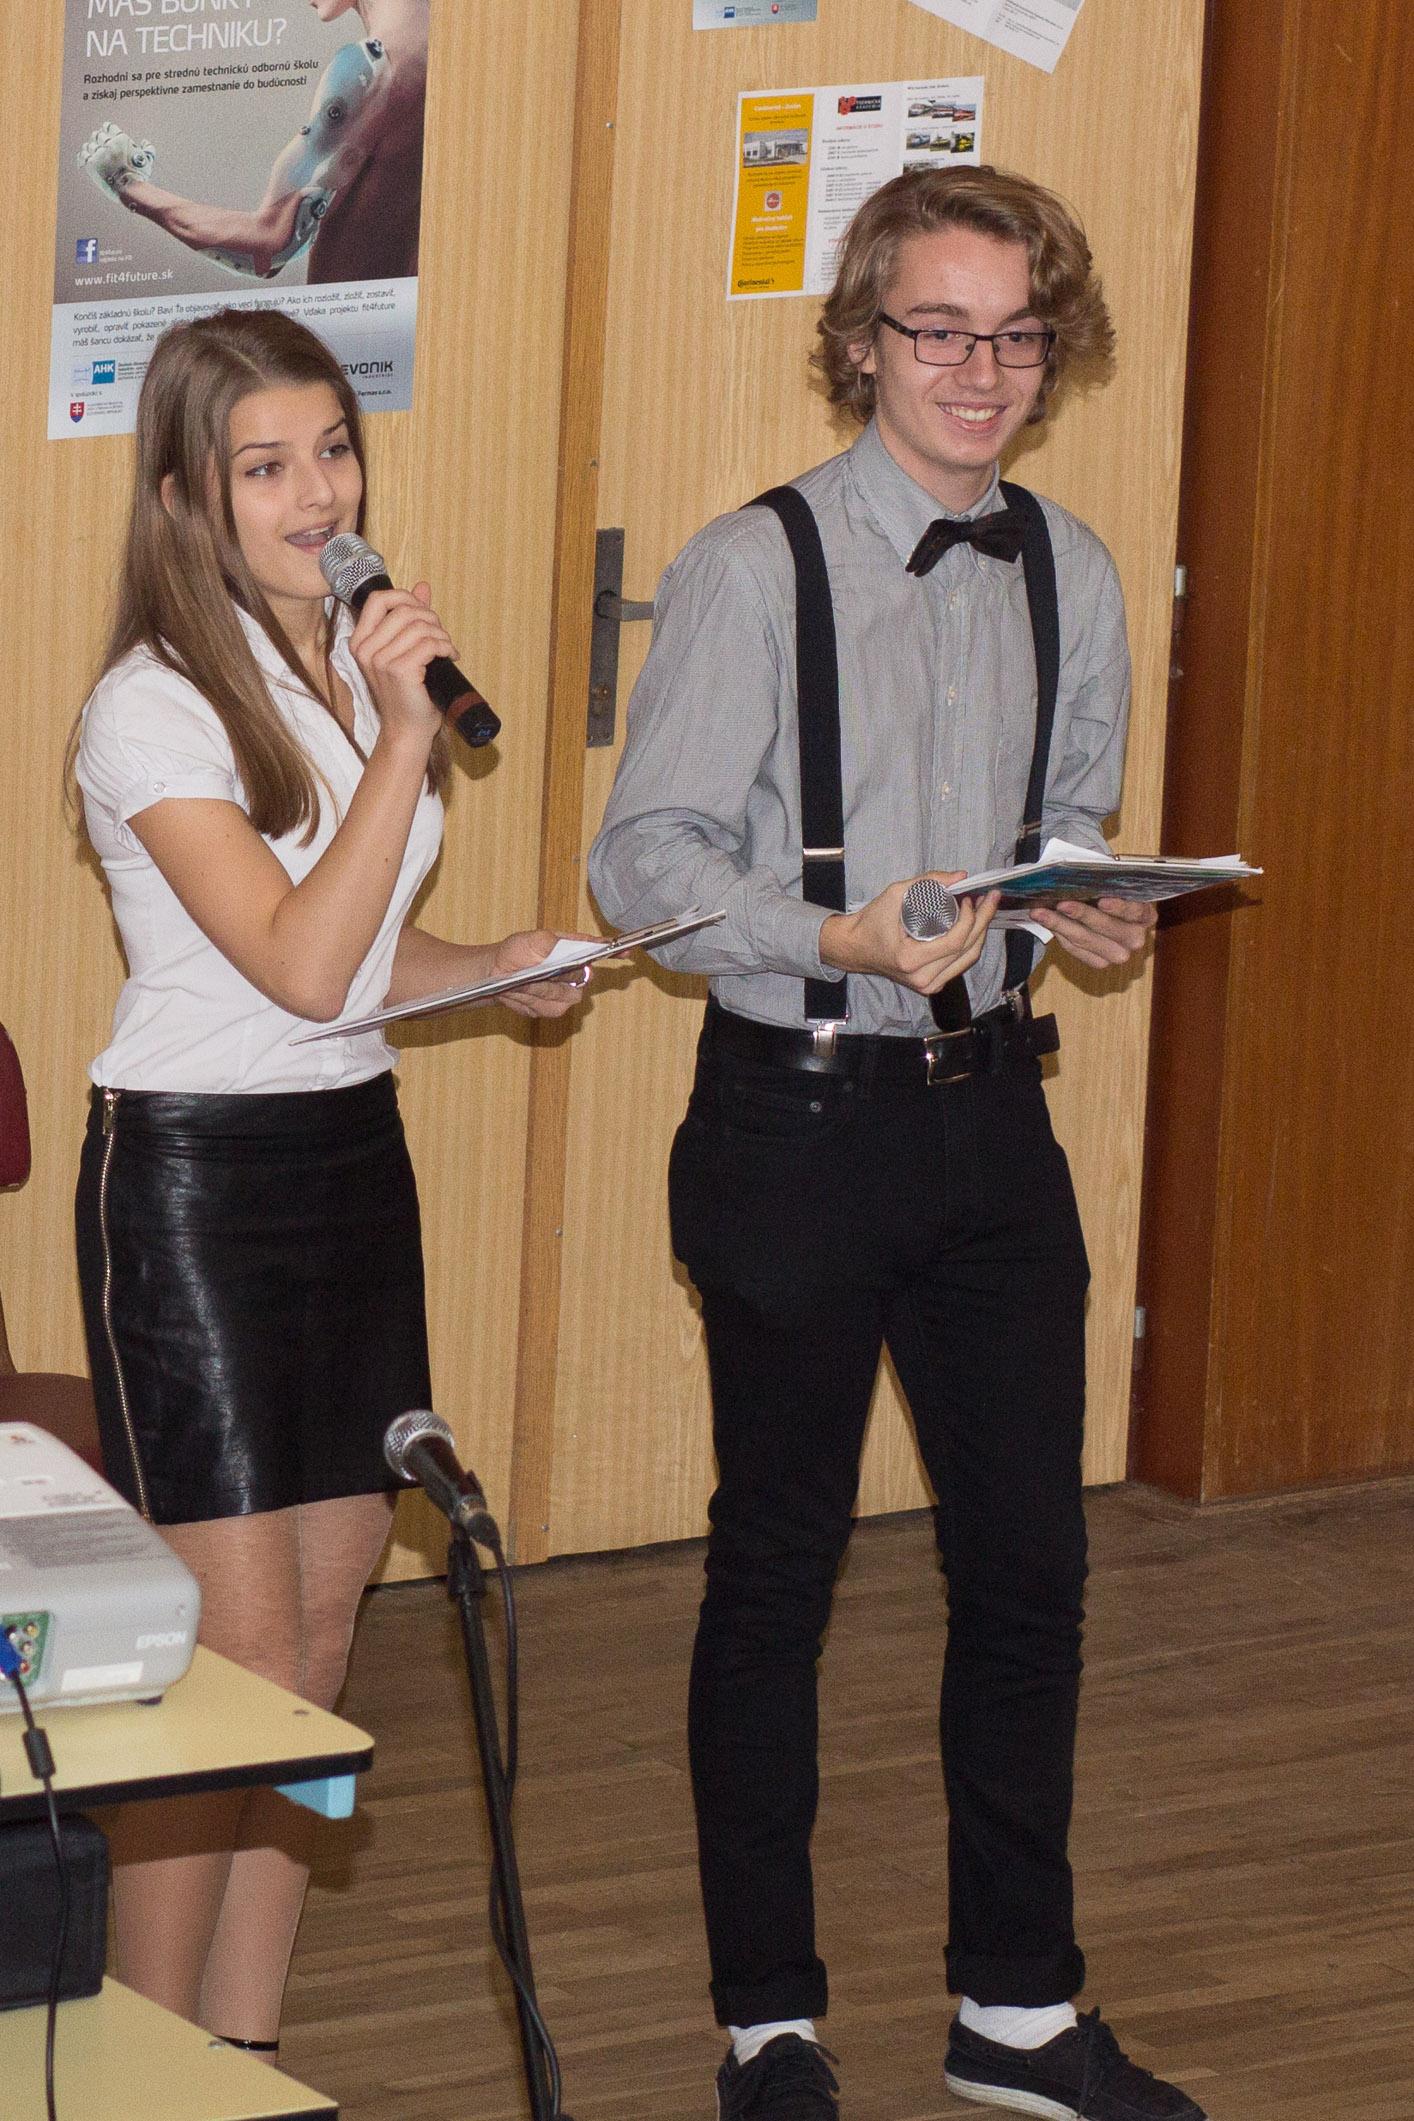 alica-krnacova-emanuel-kucbel-2014-konferencia